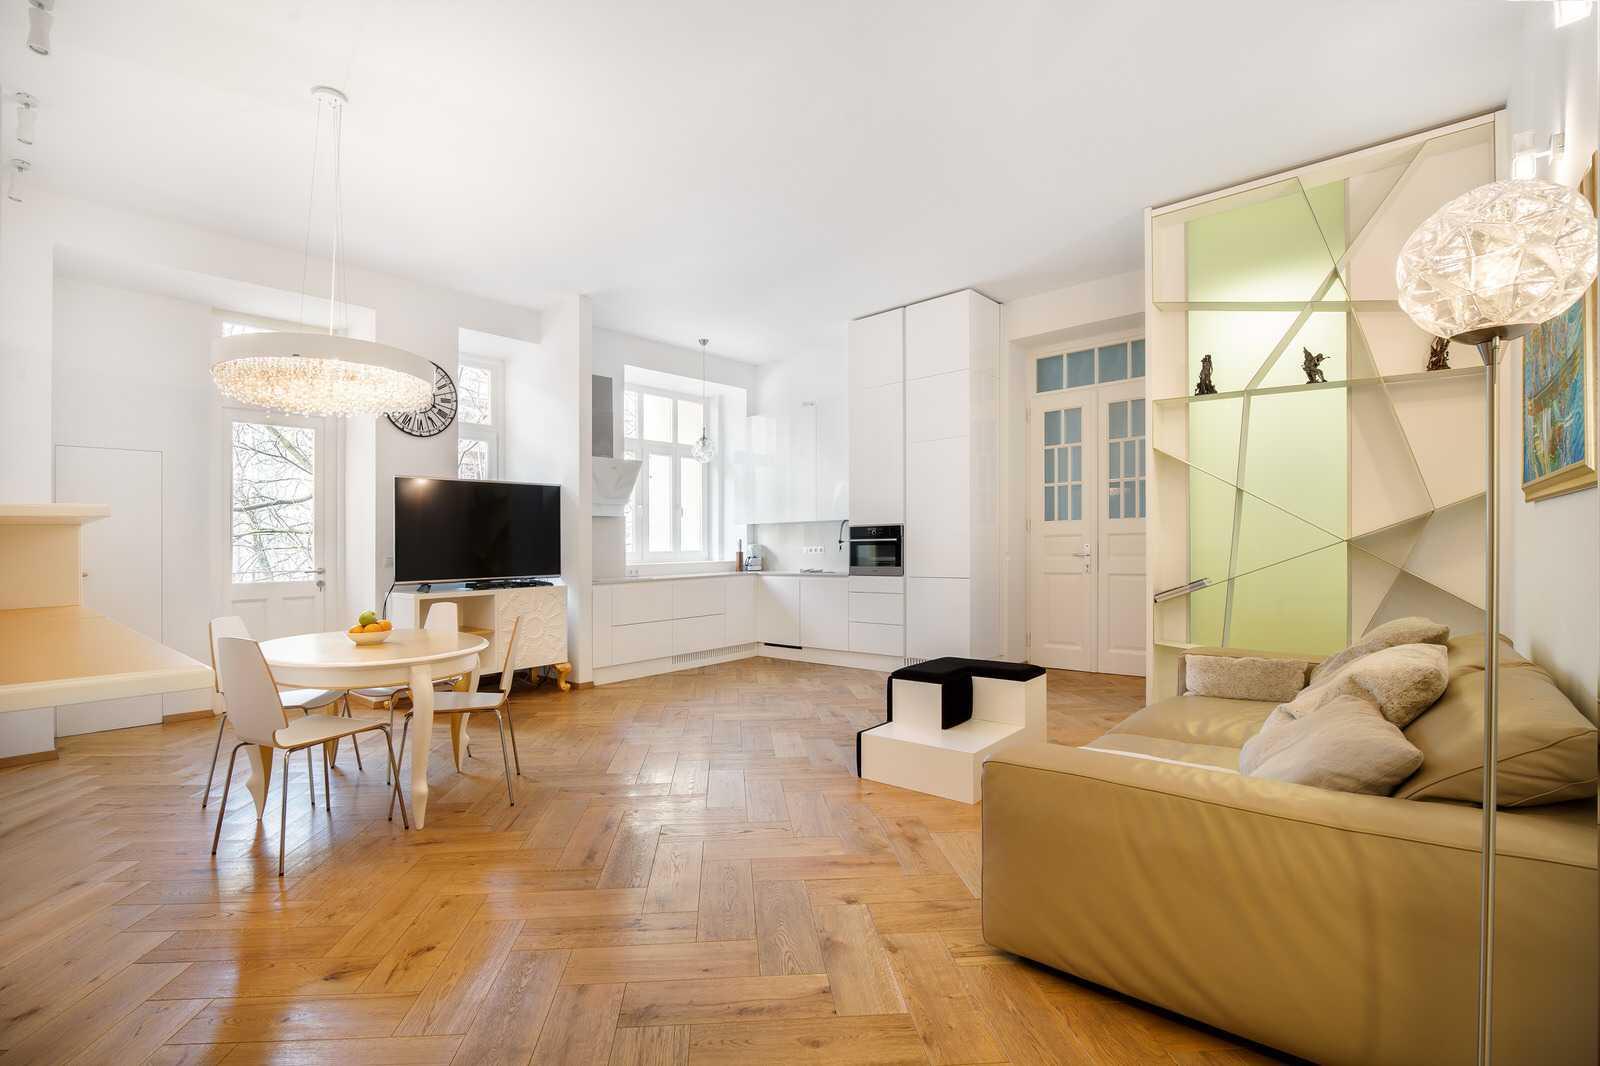 Ljubljana 2-bedroom Beethovnova apartment's big open space living room with kitchen diner